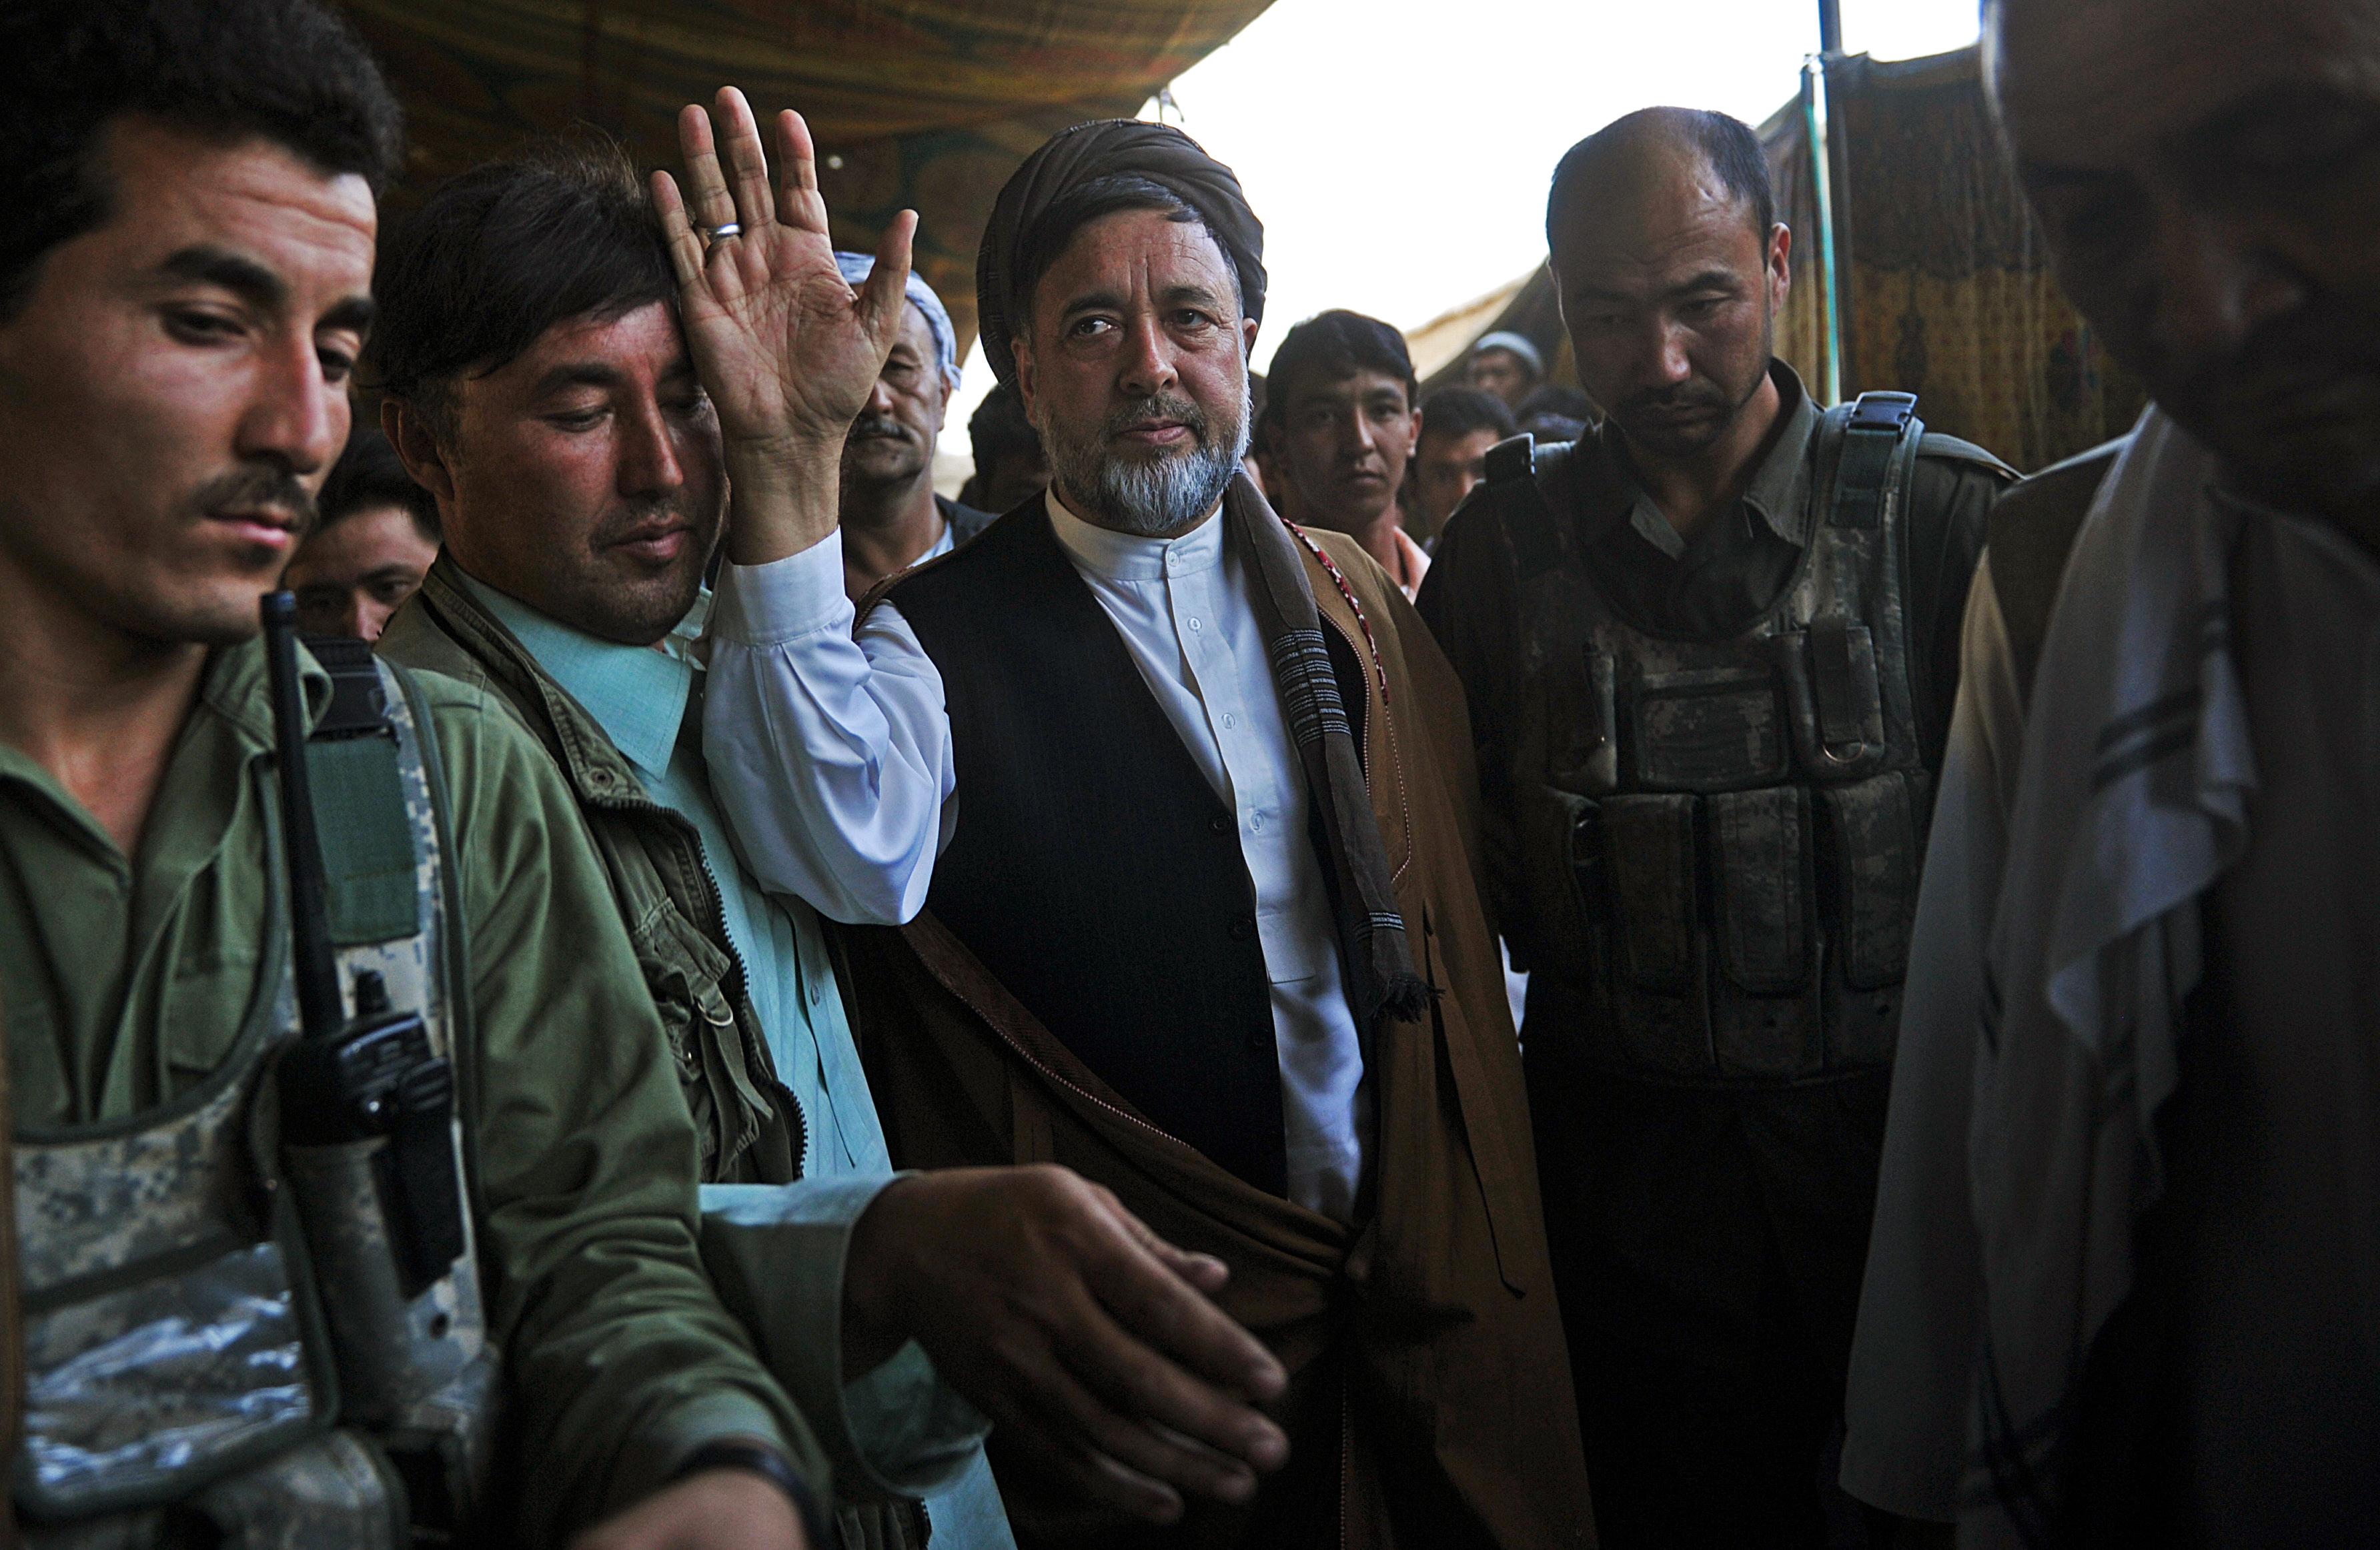 Mohaqiq draws fire for praising Iran's recruitment of Afghans in Syrian war